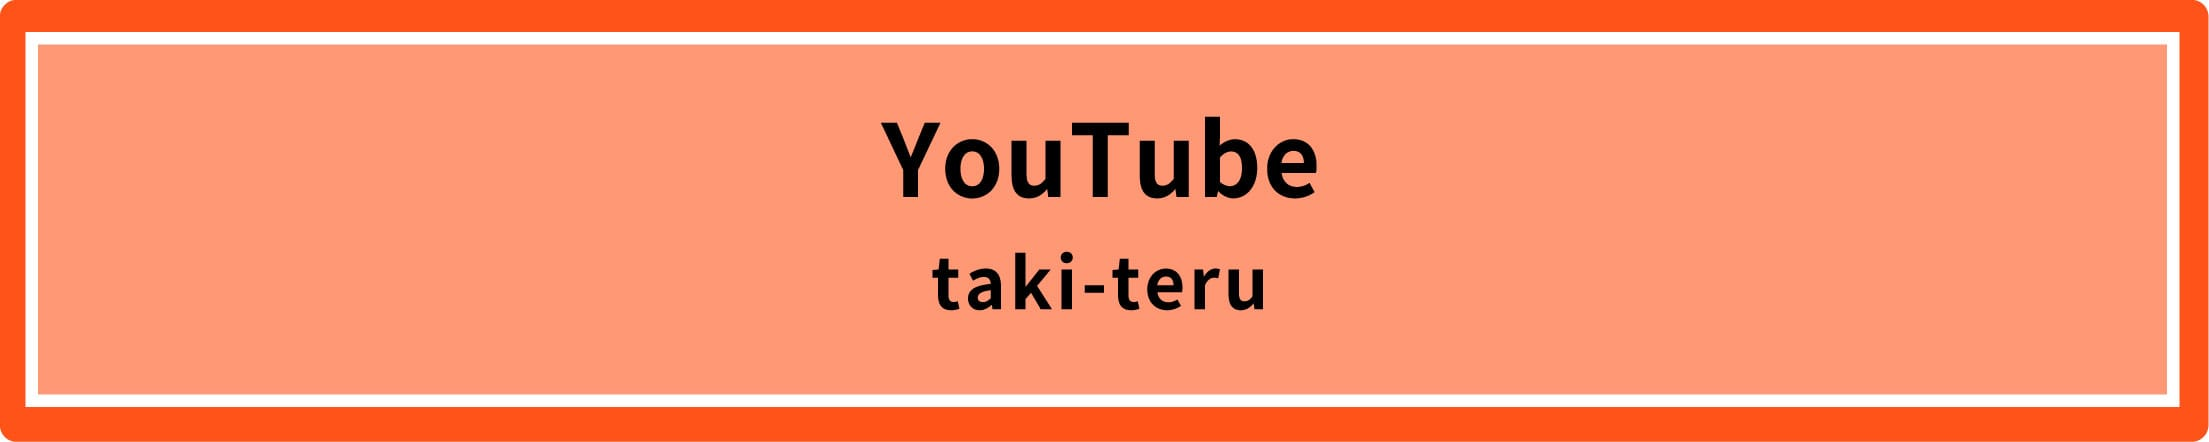 響道宴YouTube taki-teru